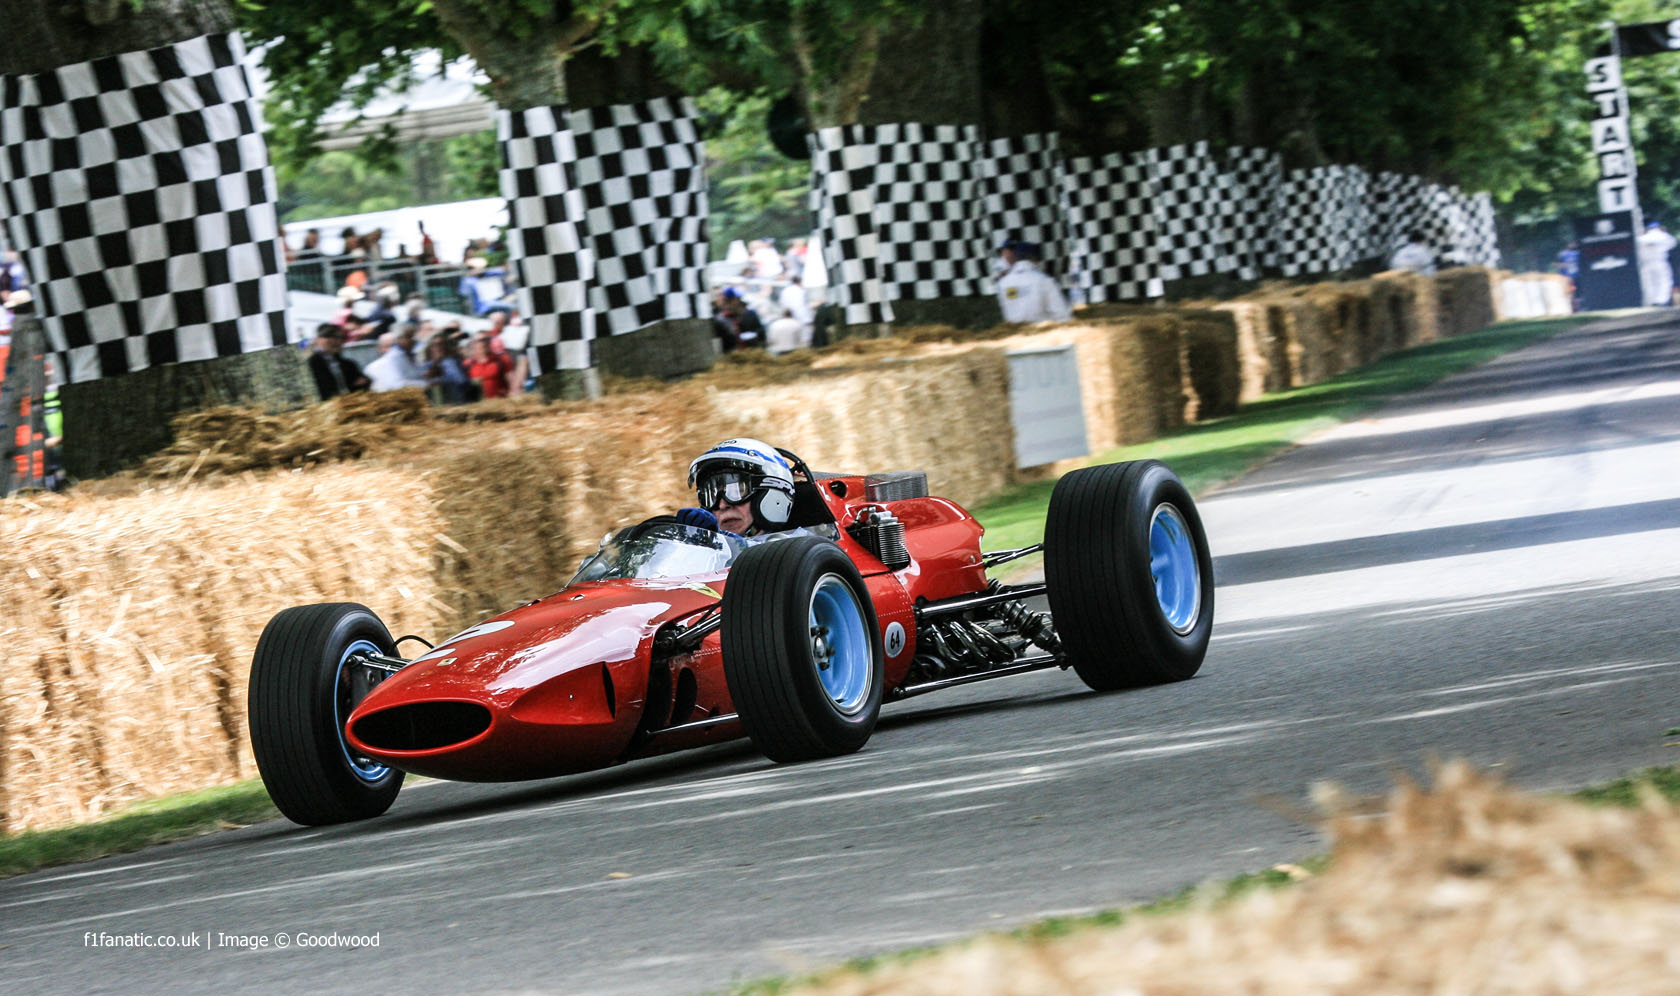 John Surtees (1), Goodwood Festival of Speed, 2014